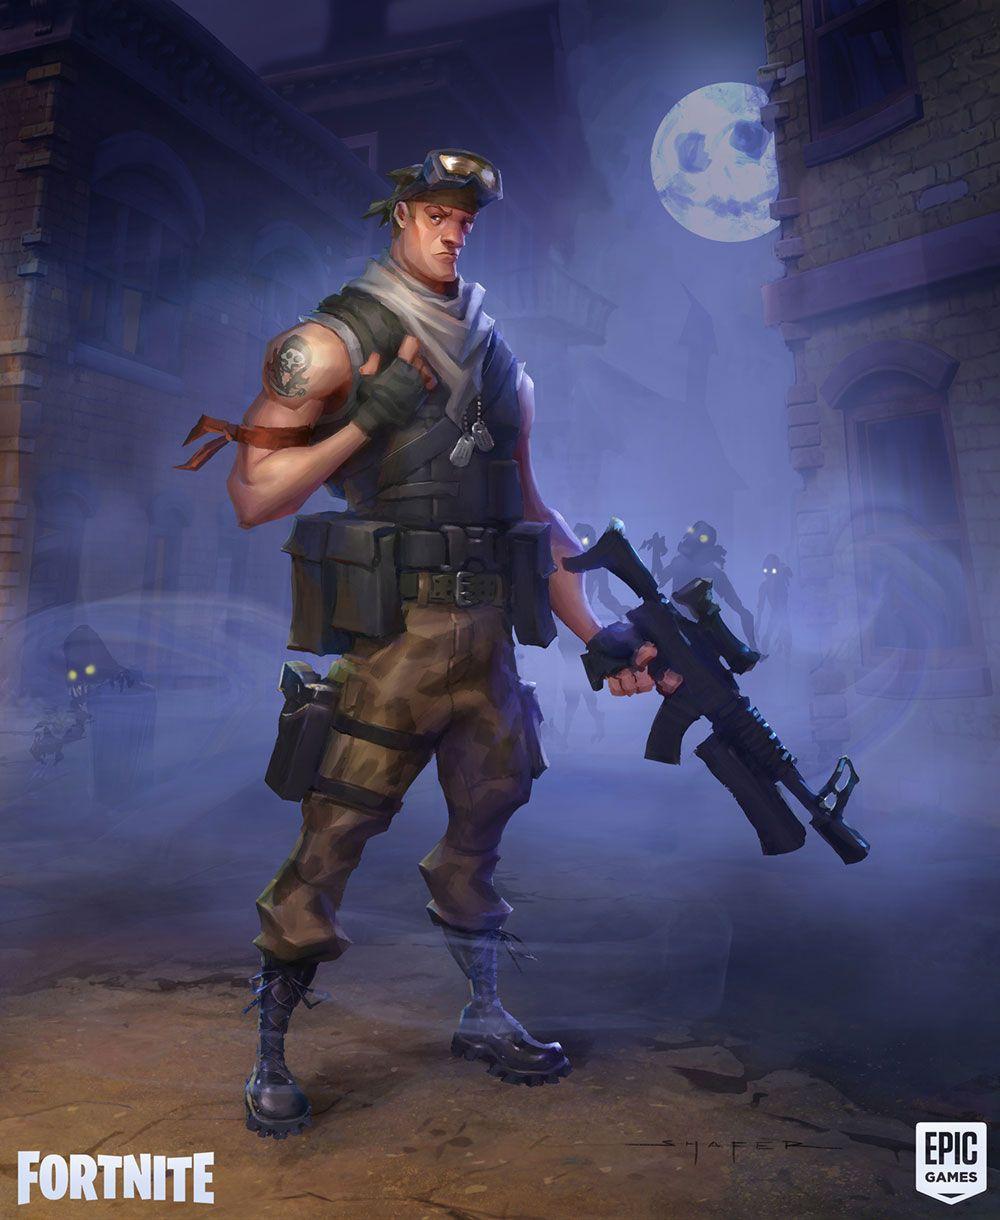 Male Commando From Fortnite Concept Art Military Artwork Art